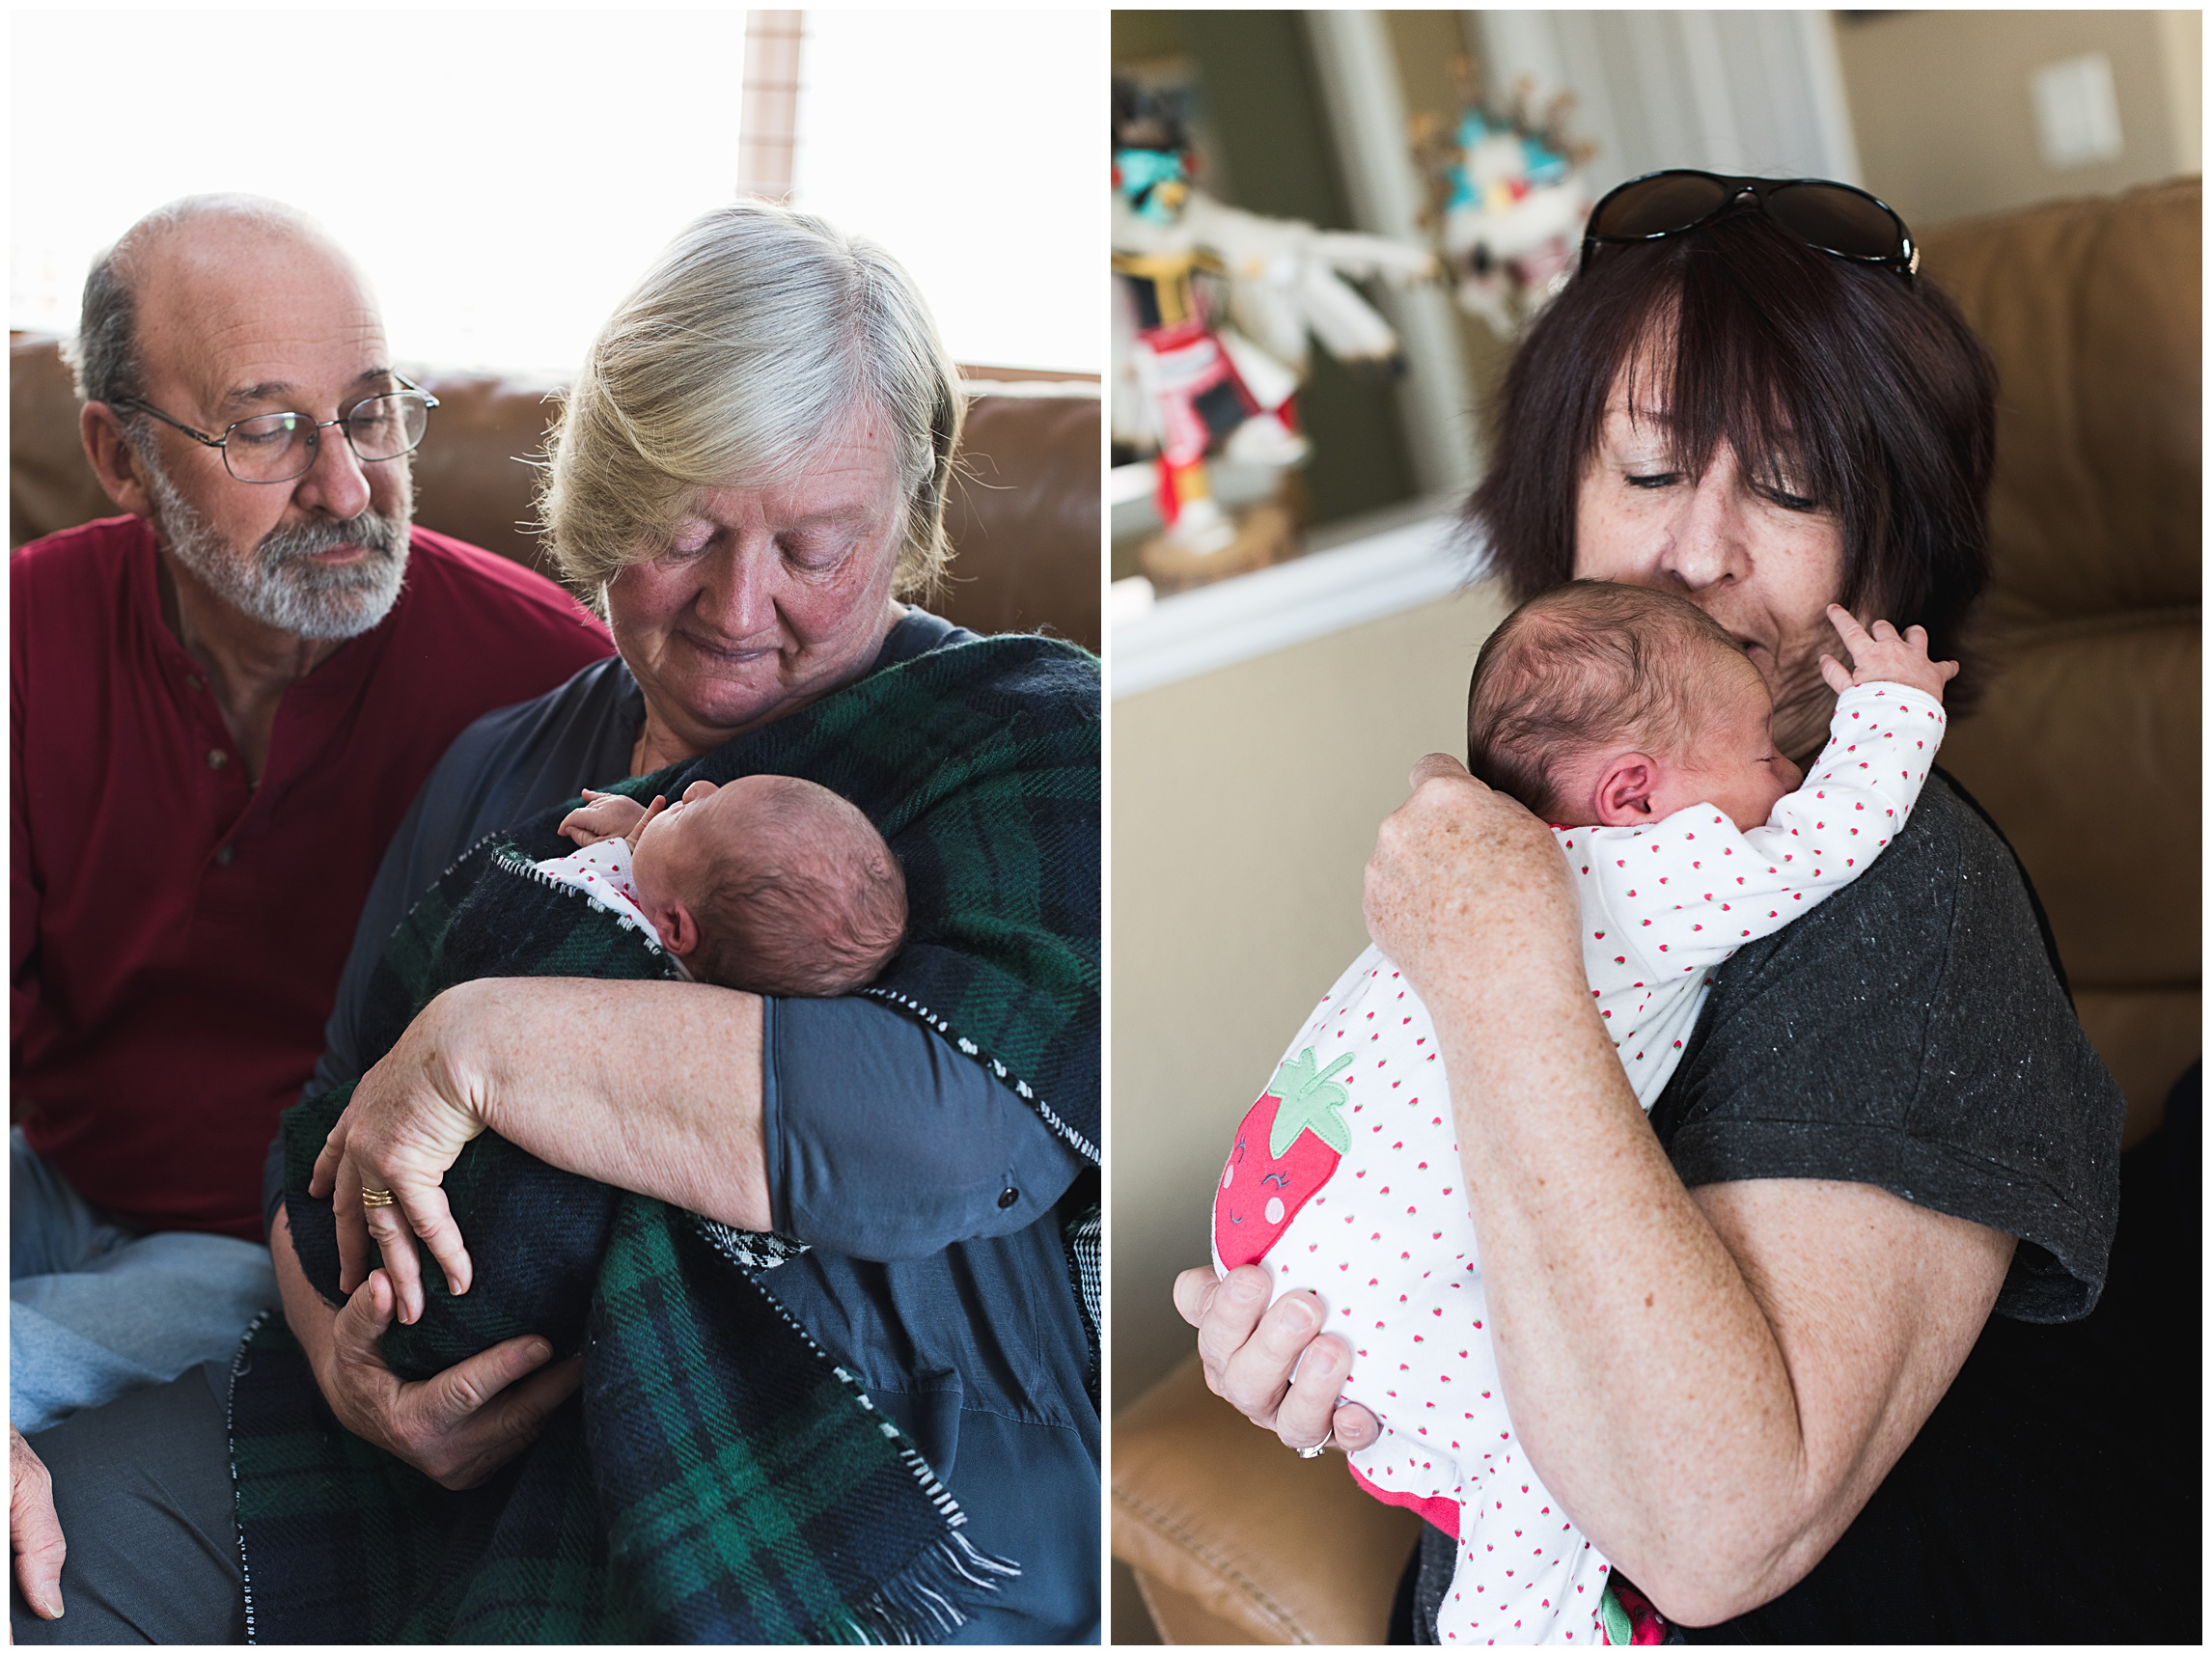 Proud grandparents lovingly hold their sleeping newborn granddaughter. Film family portraits by Sonja Salzburg of Sonja K Photography.